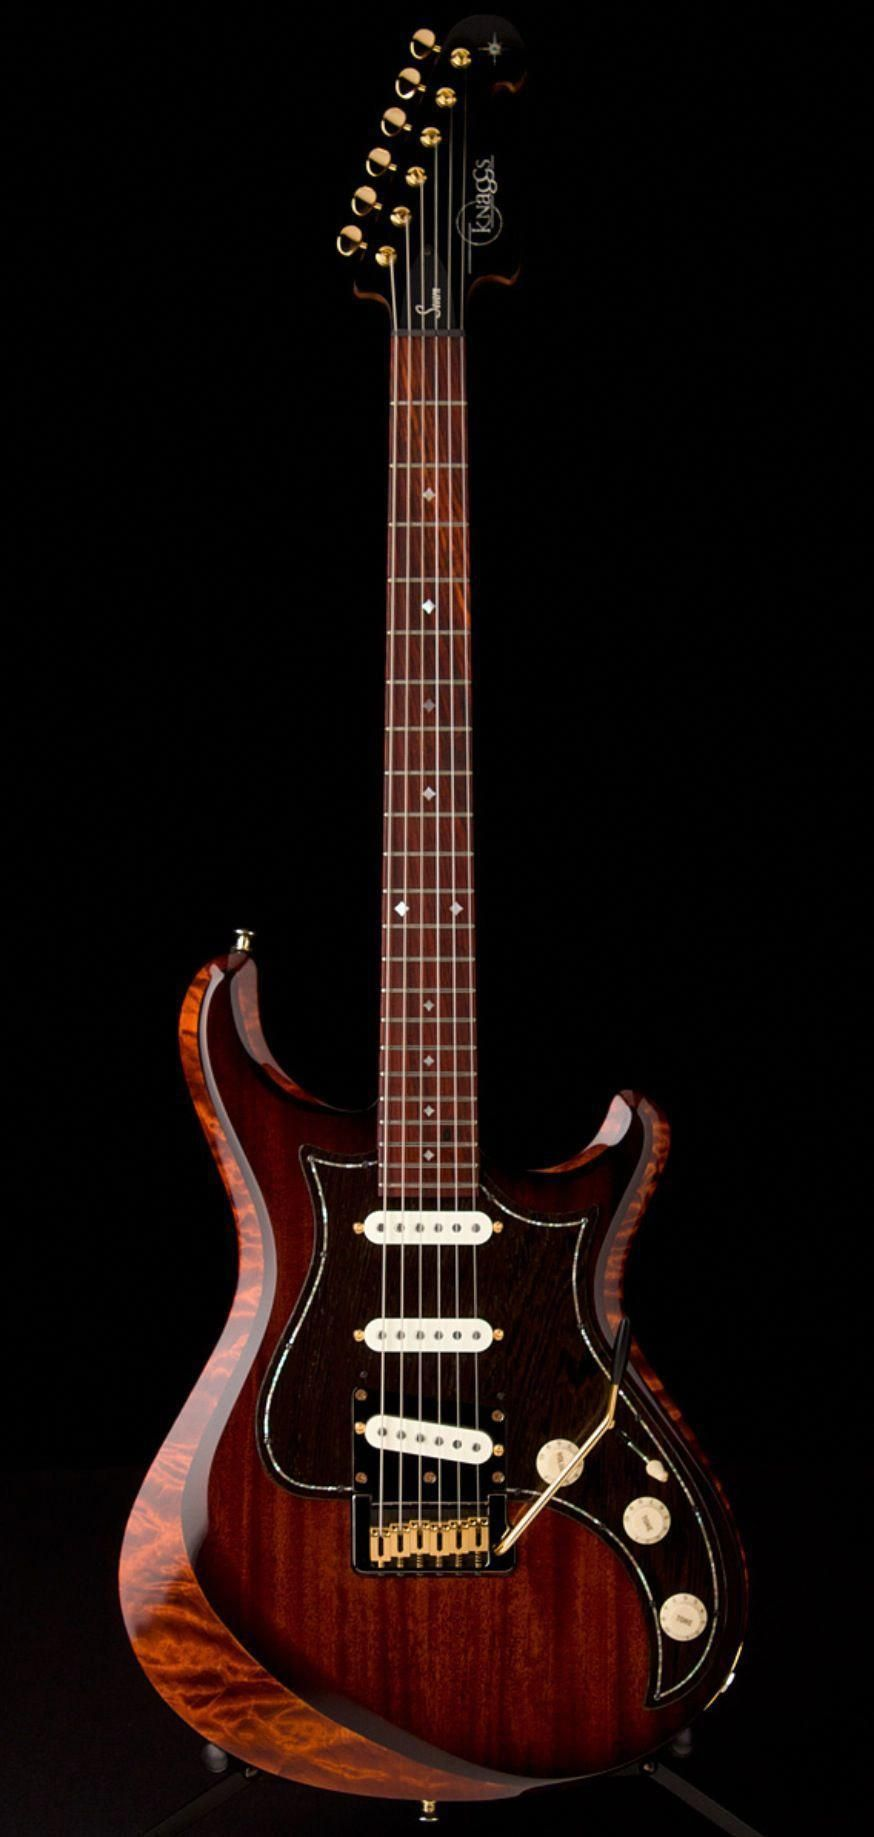 Fender Stratocaster Guitars Guitar Center >> Knaggs Severin Tier 1 In Aged Scotch Guitar Center Prsguitars